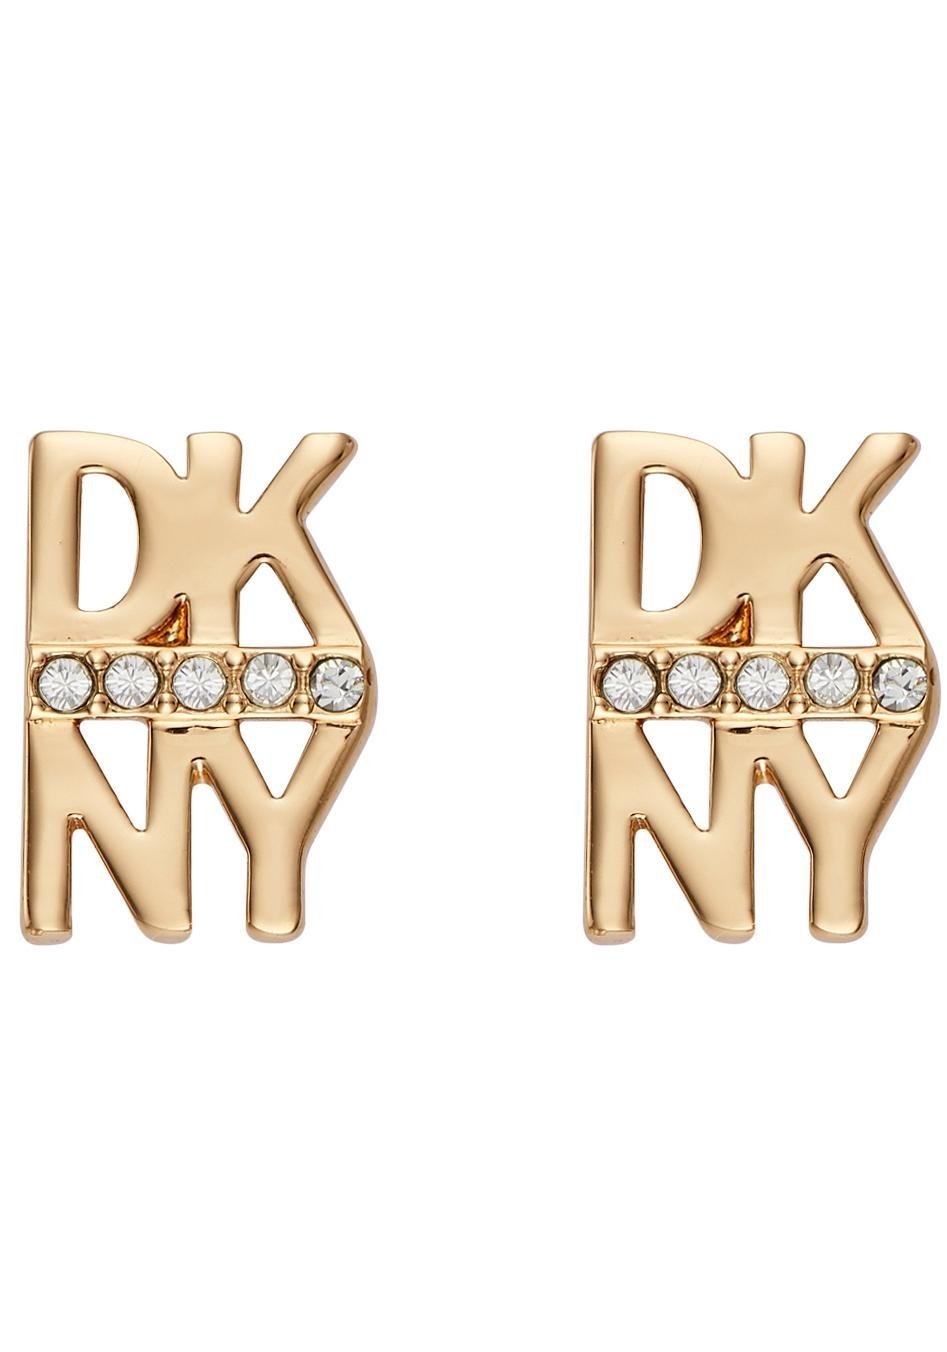 DKNY oorstekers »Stacked Pave Logo Stud ER (GL), 5520004« in de webshop van OTTO kopen